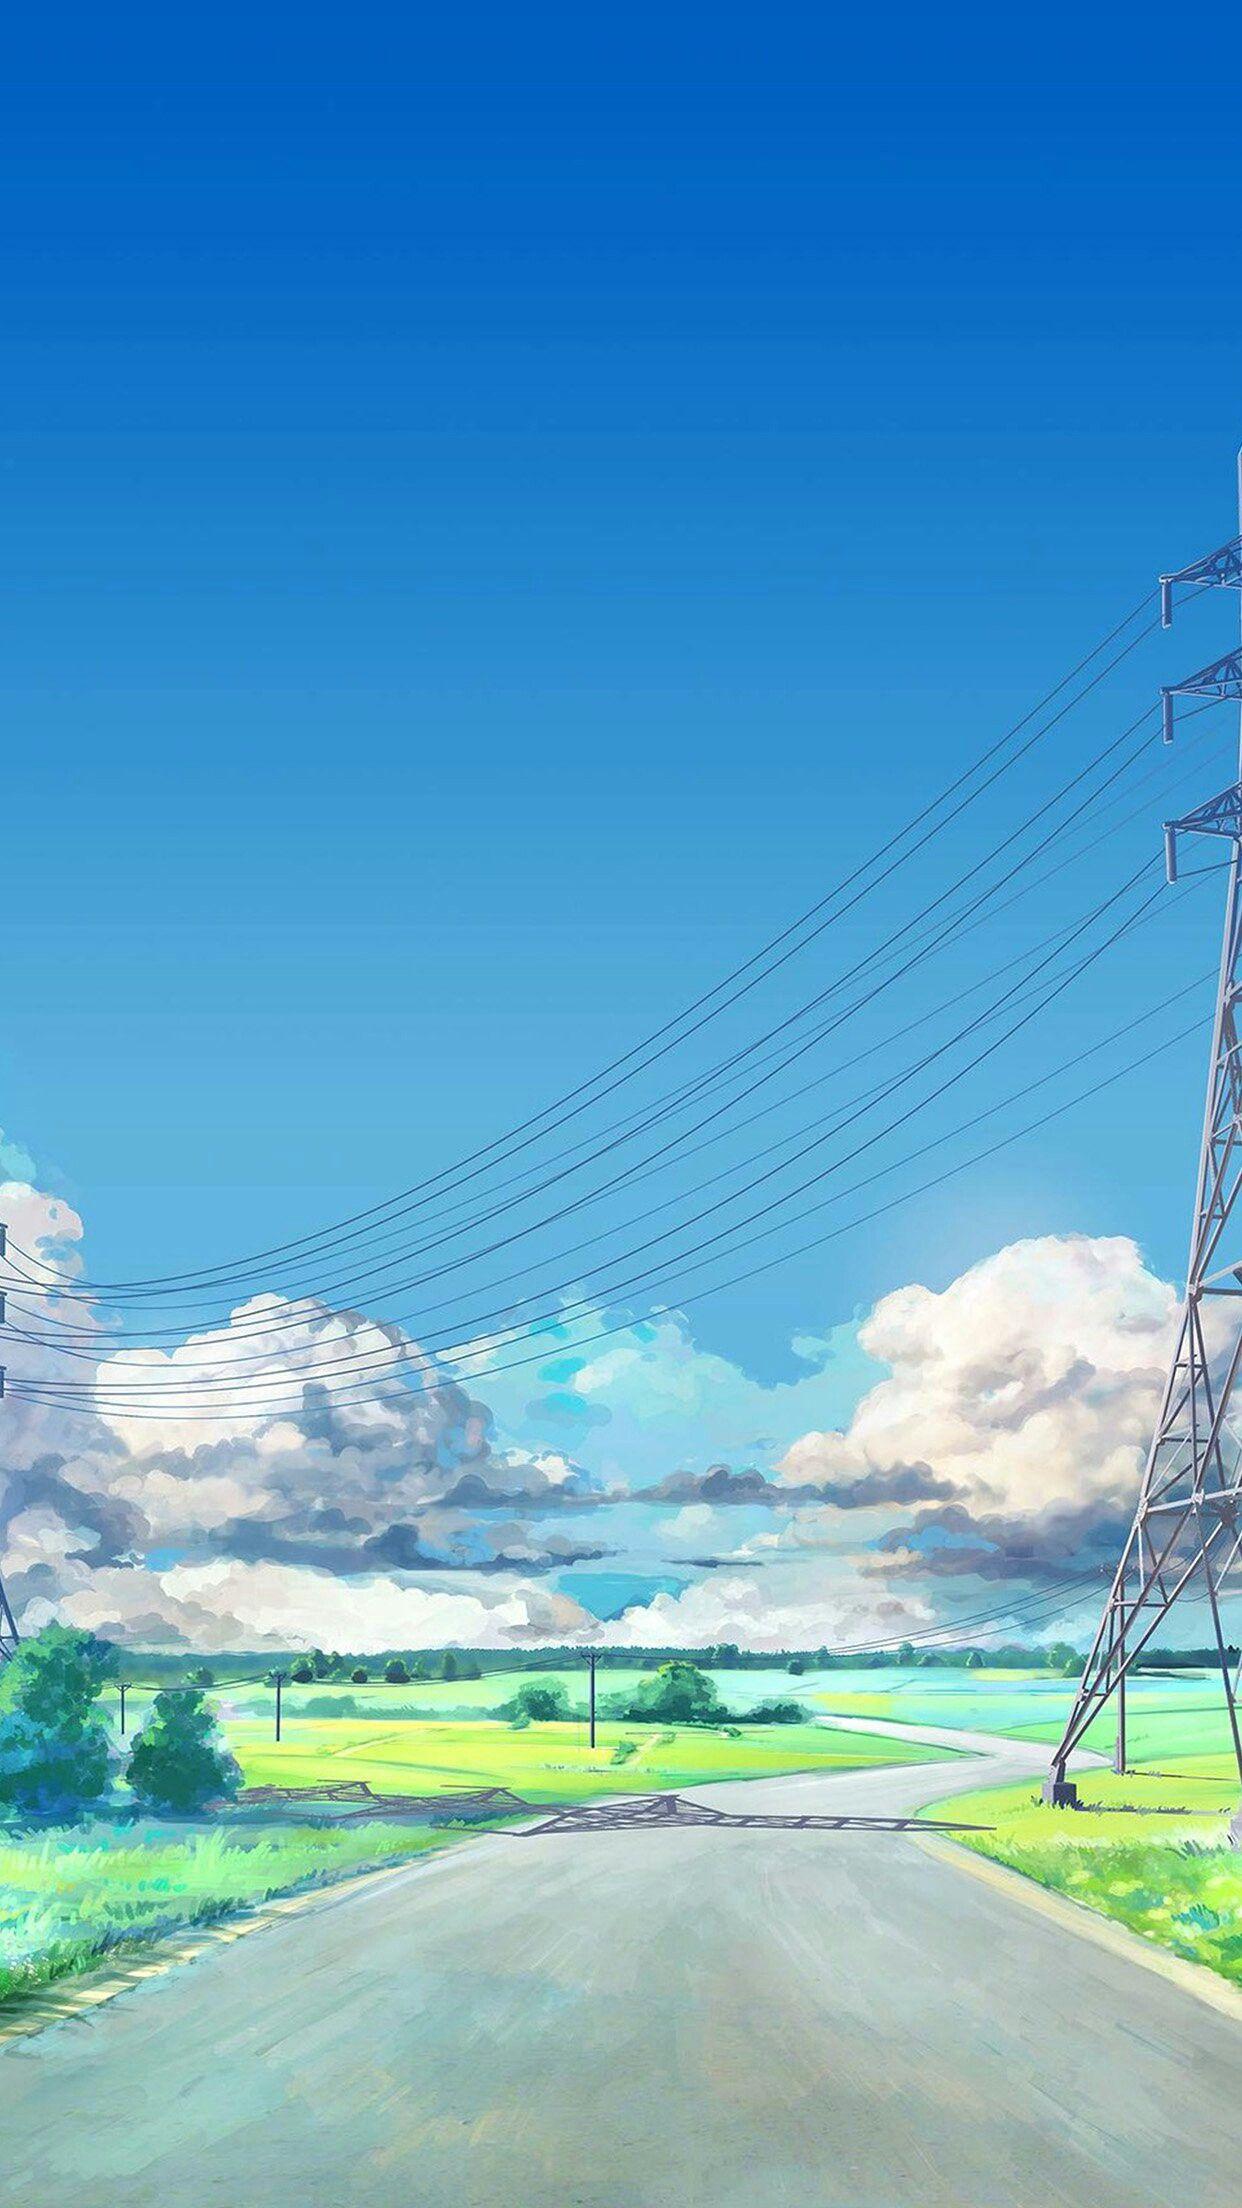 Pin by Iyan Sofyan on Material °Minimal °Pattern | Anime ...